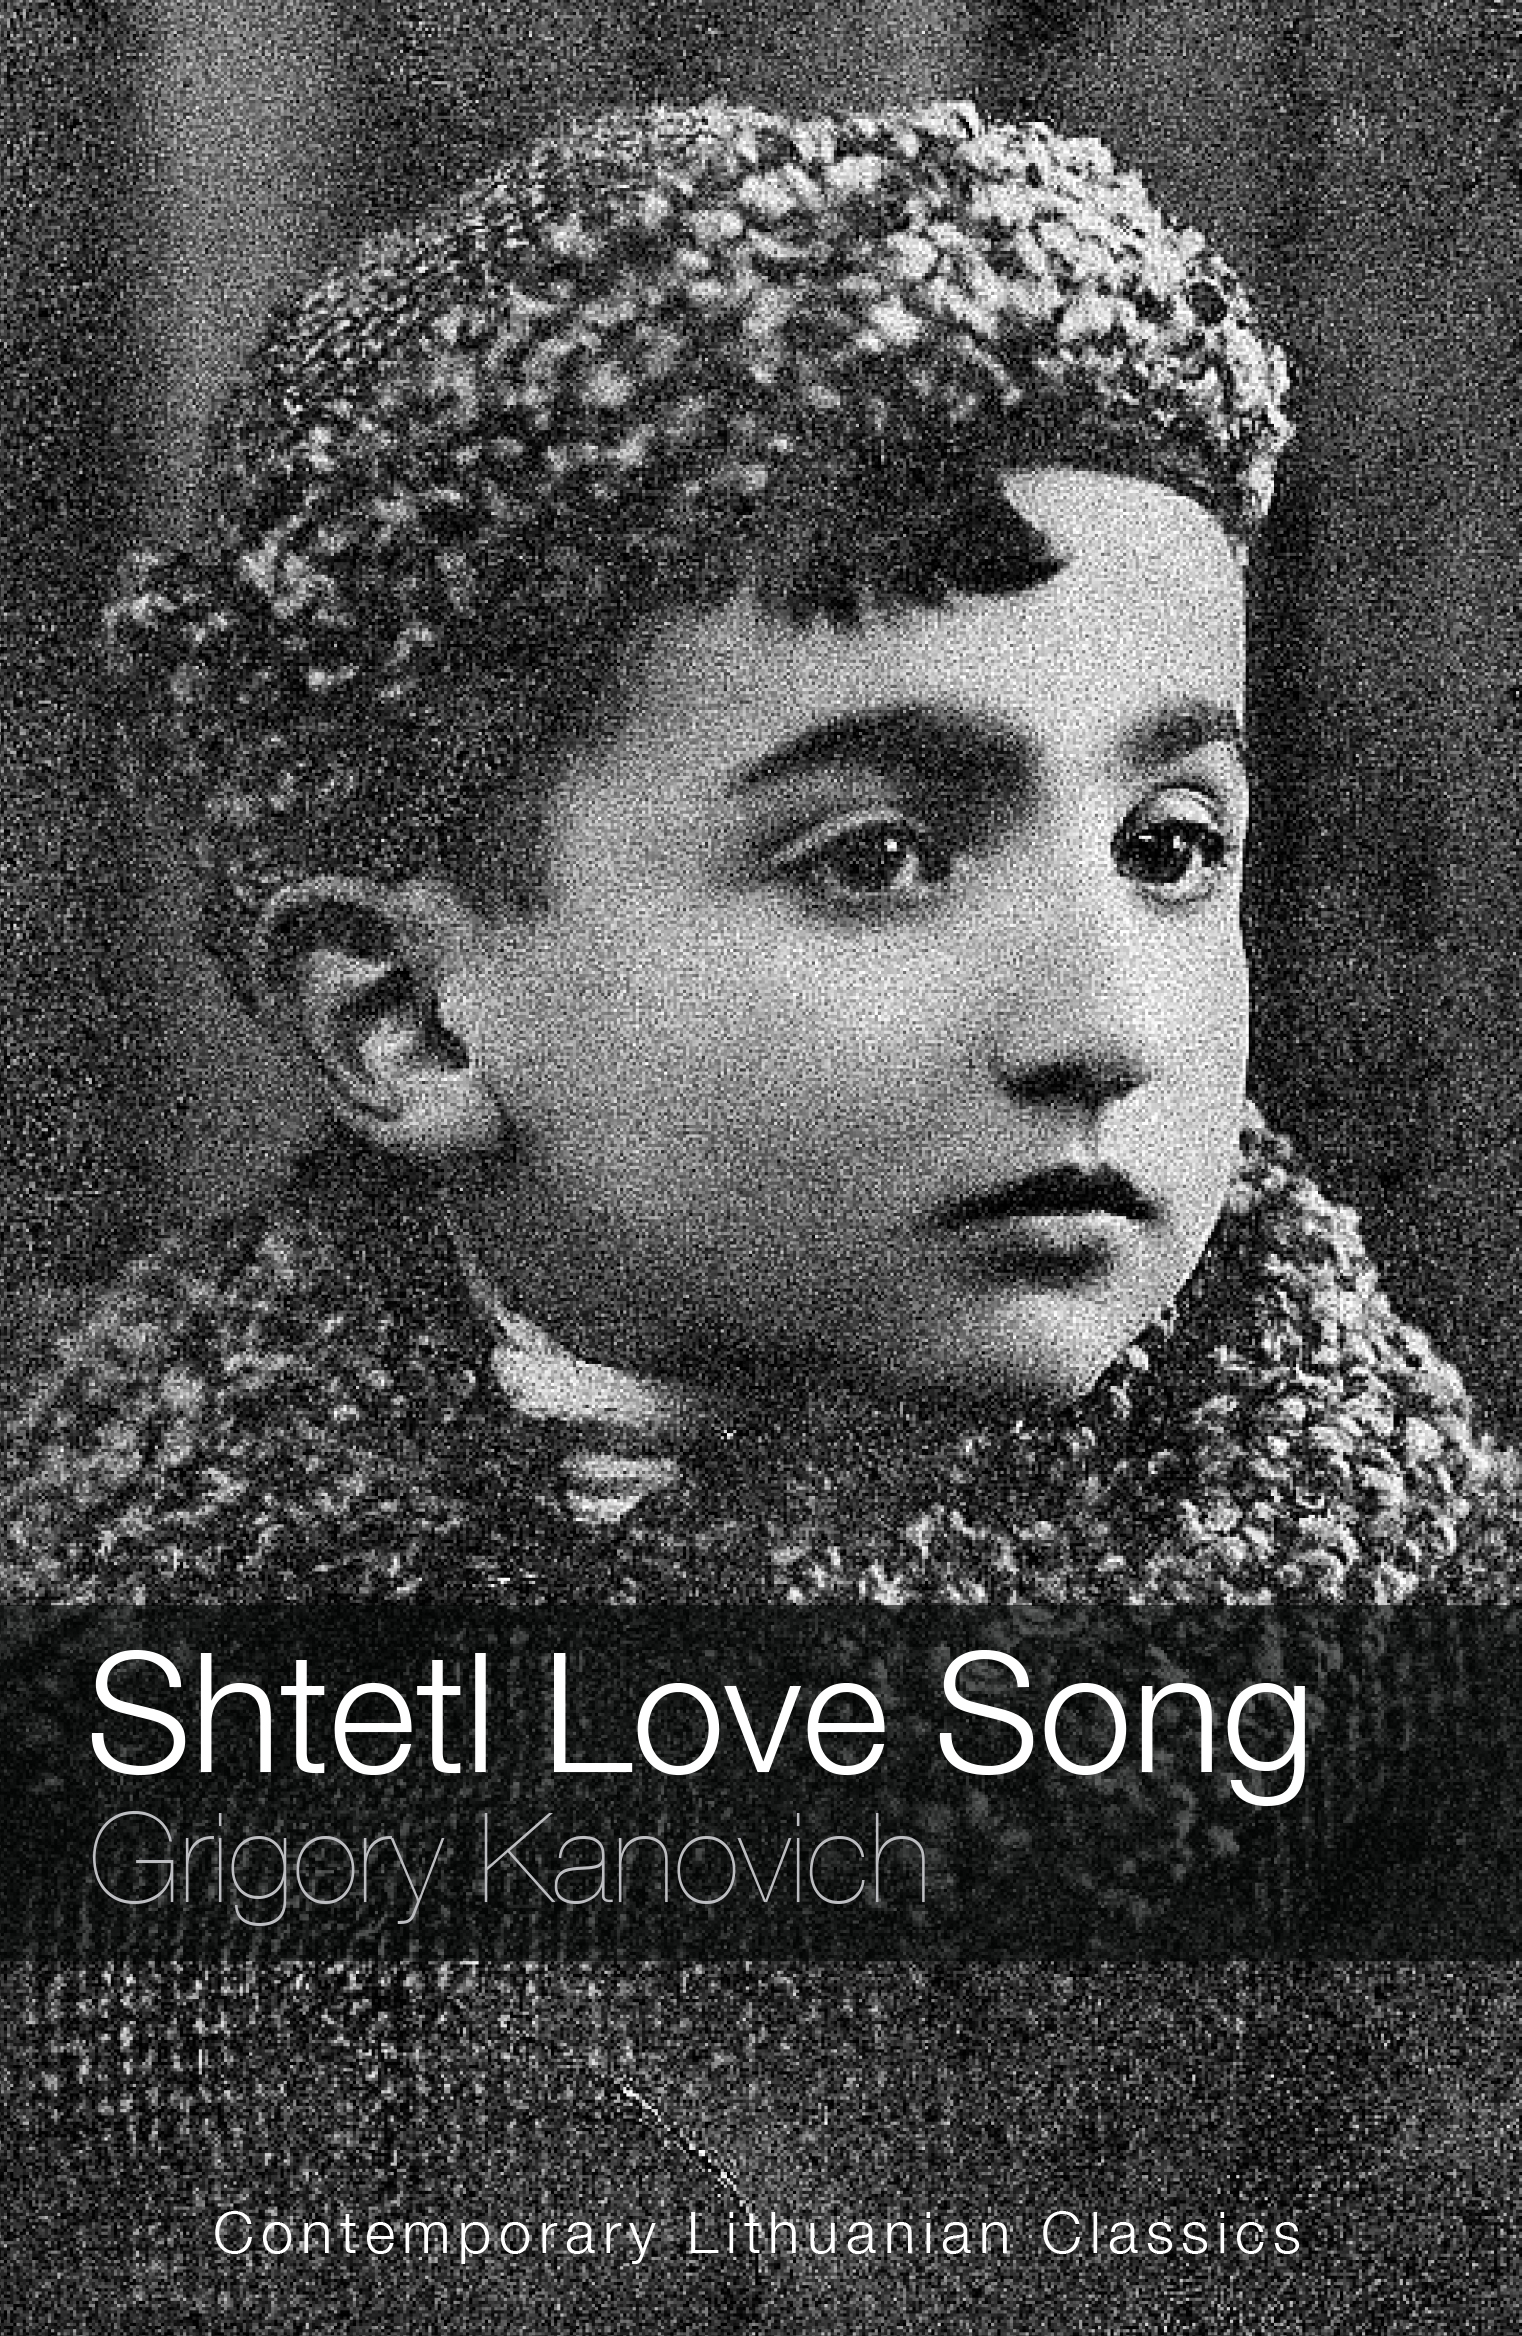 Shtetl Love Song - Grigory Kanovich